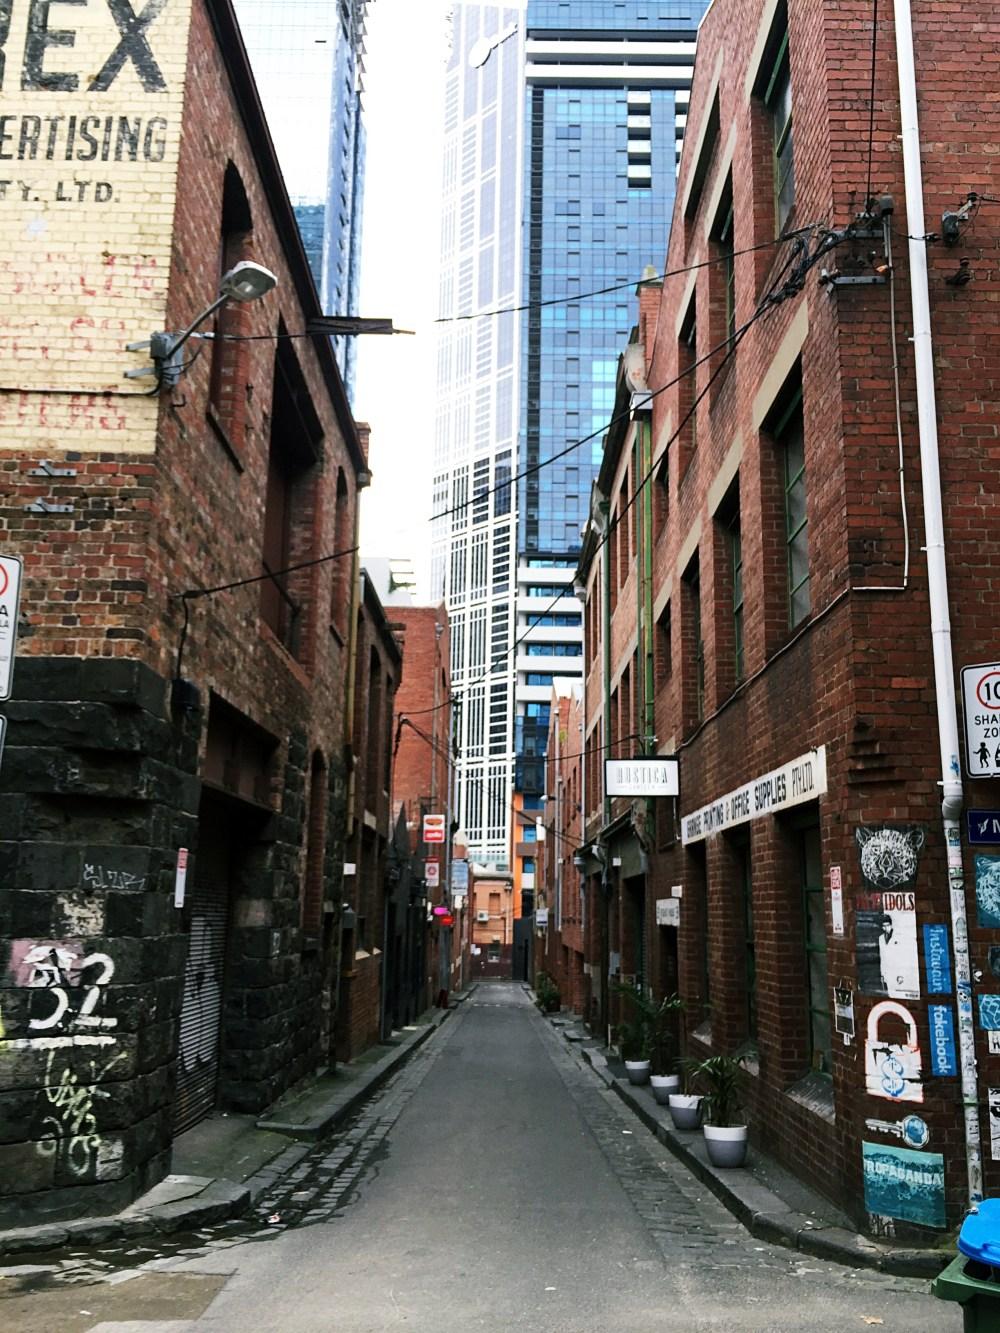 10 July 2016: Guildford Lane | Melbourne CBD, Australia